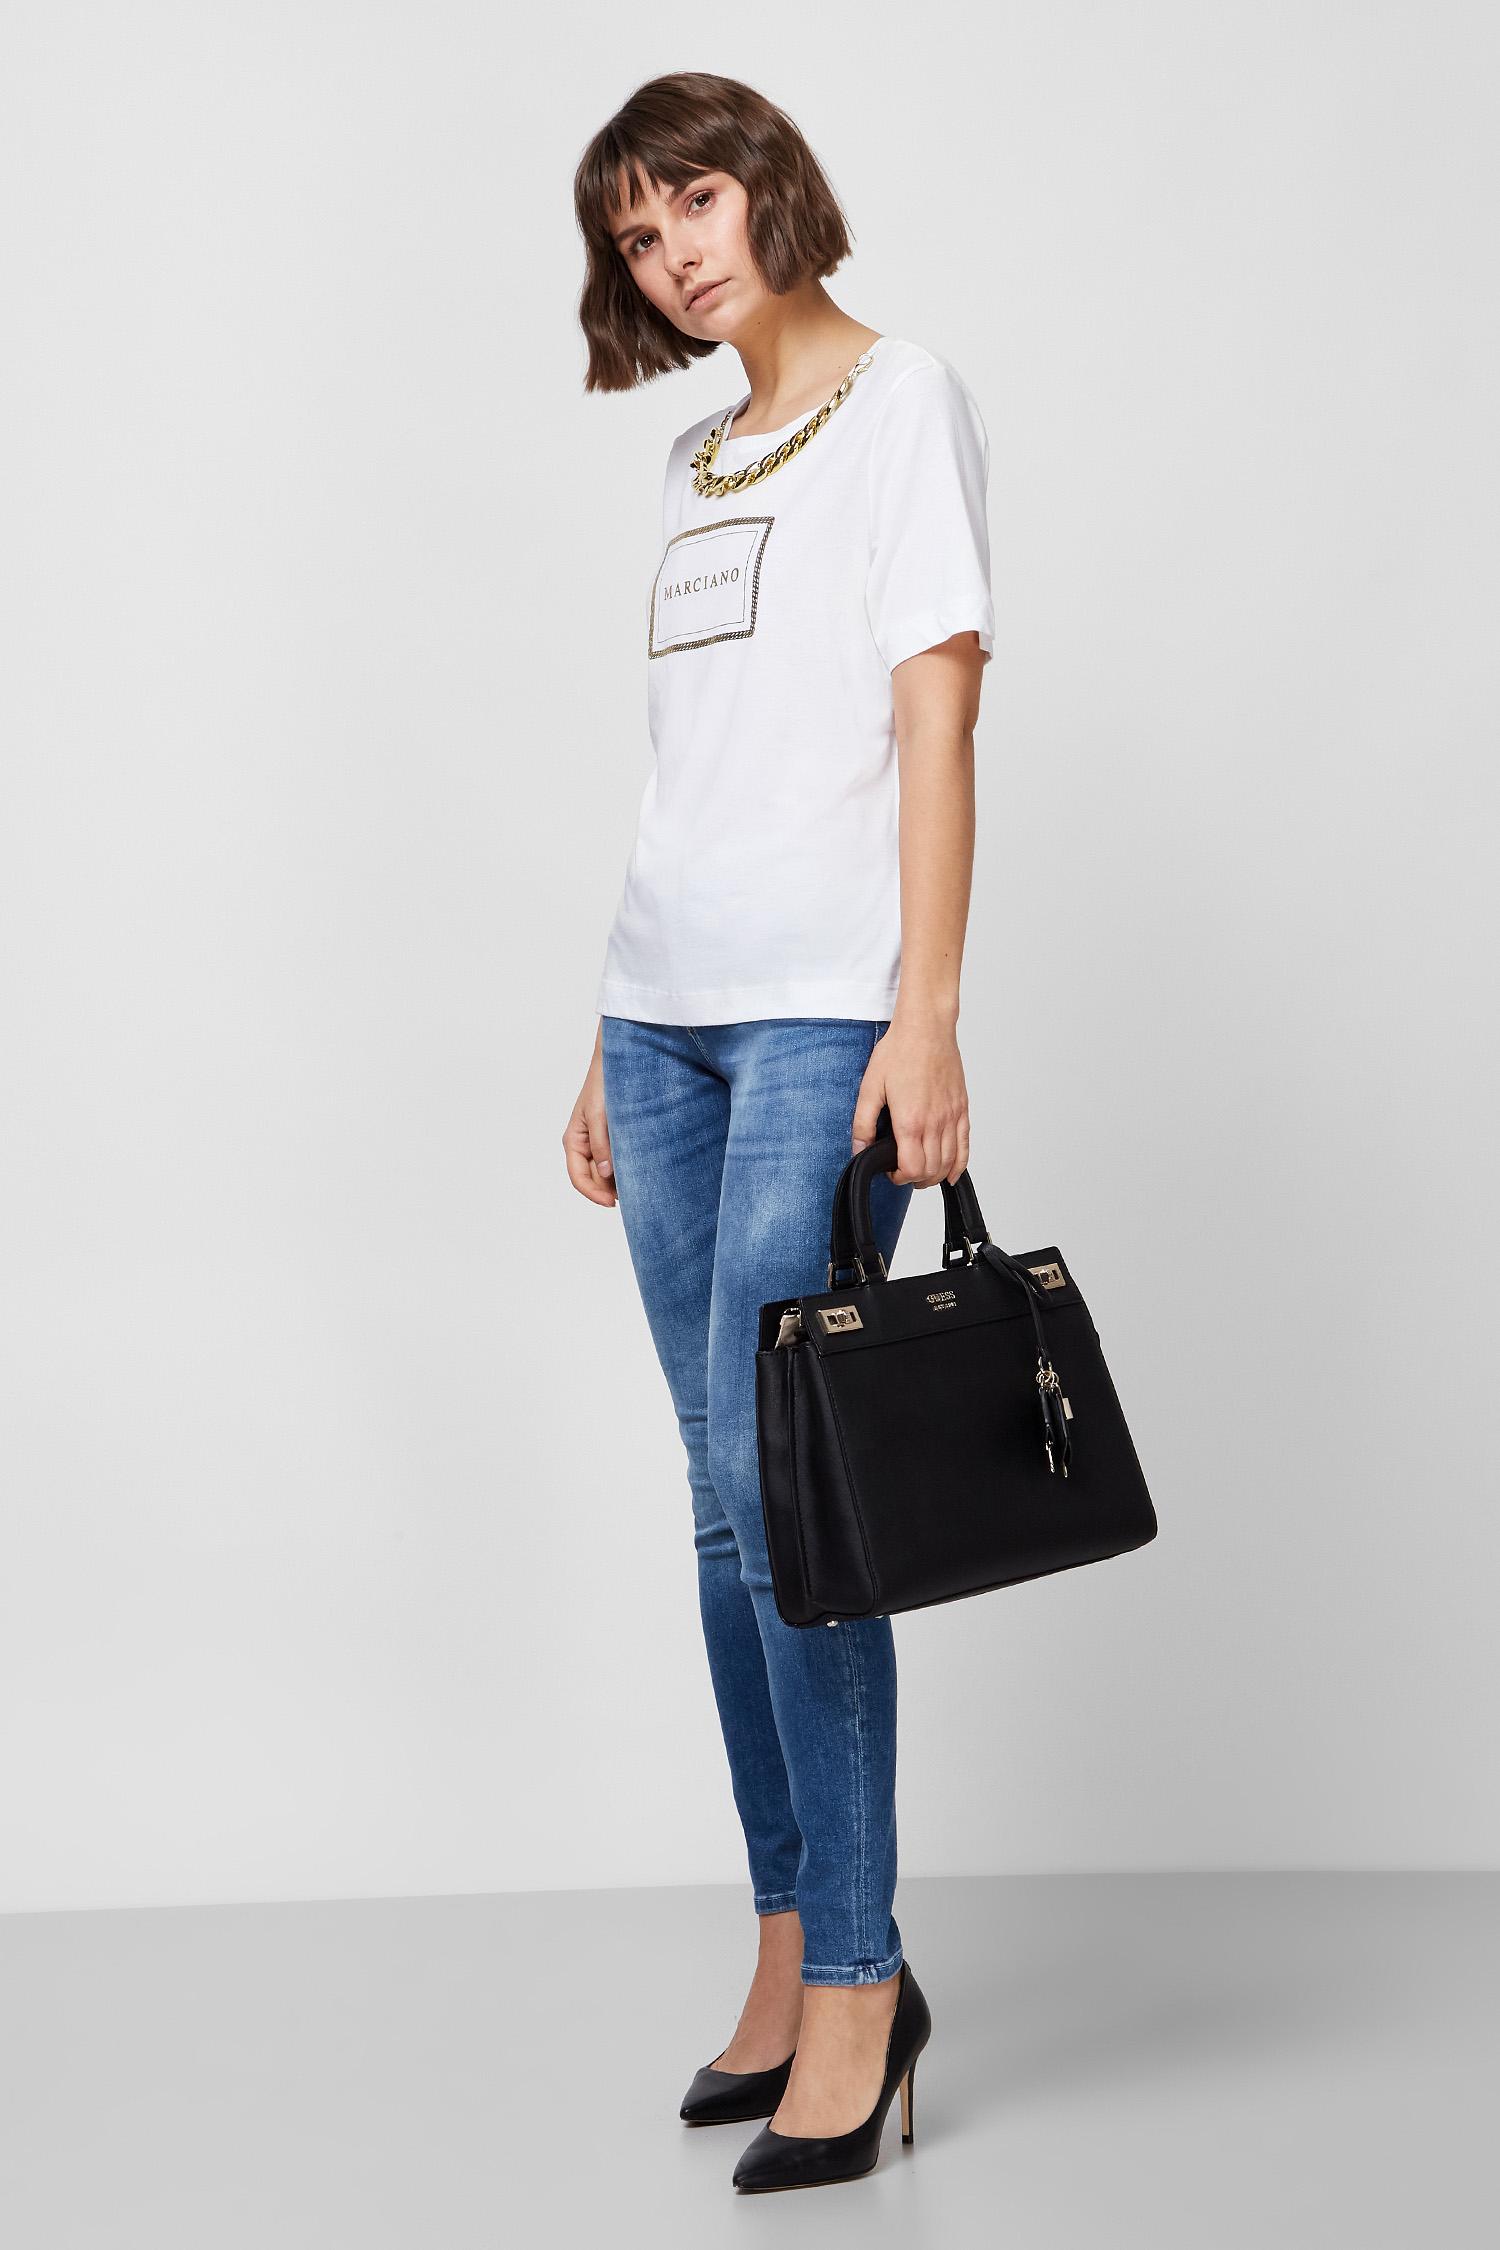 Женская белая футболка с принтом GUESS by Marciano Guess 0BG623.6007A;TWHT